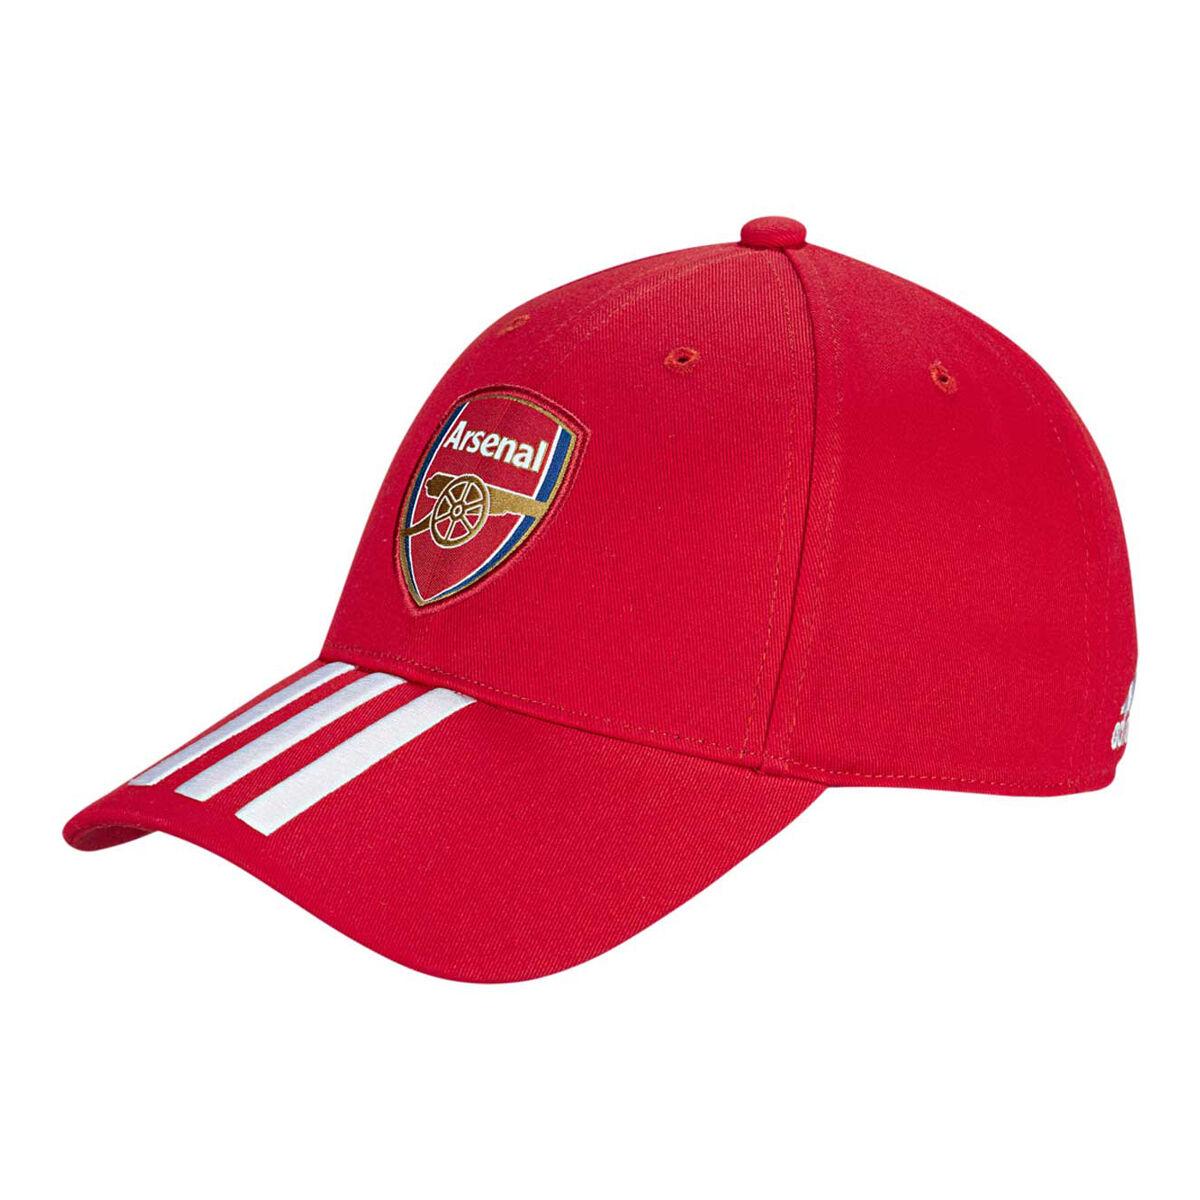 Arsenal FC Merchandise rebel